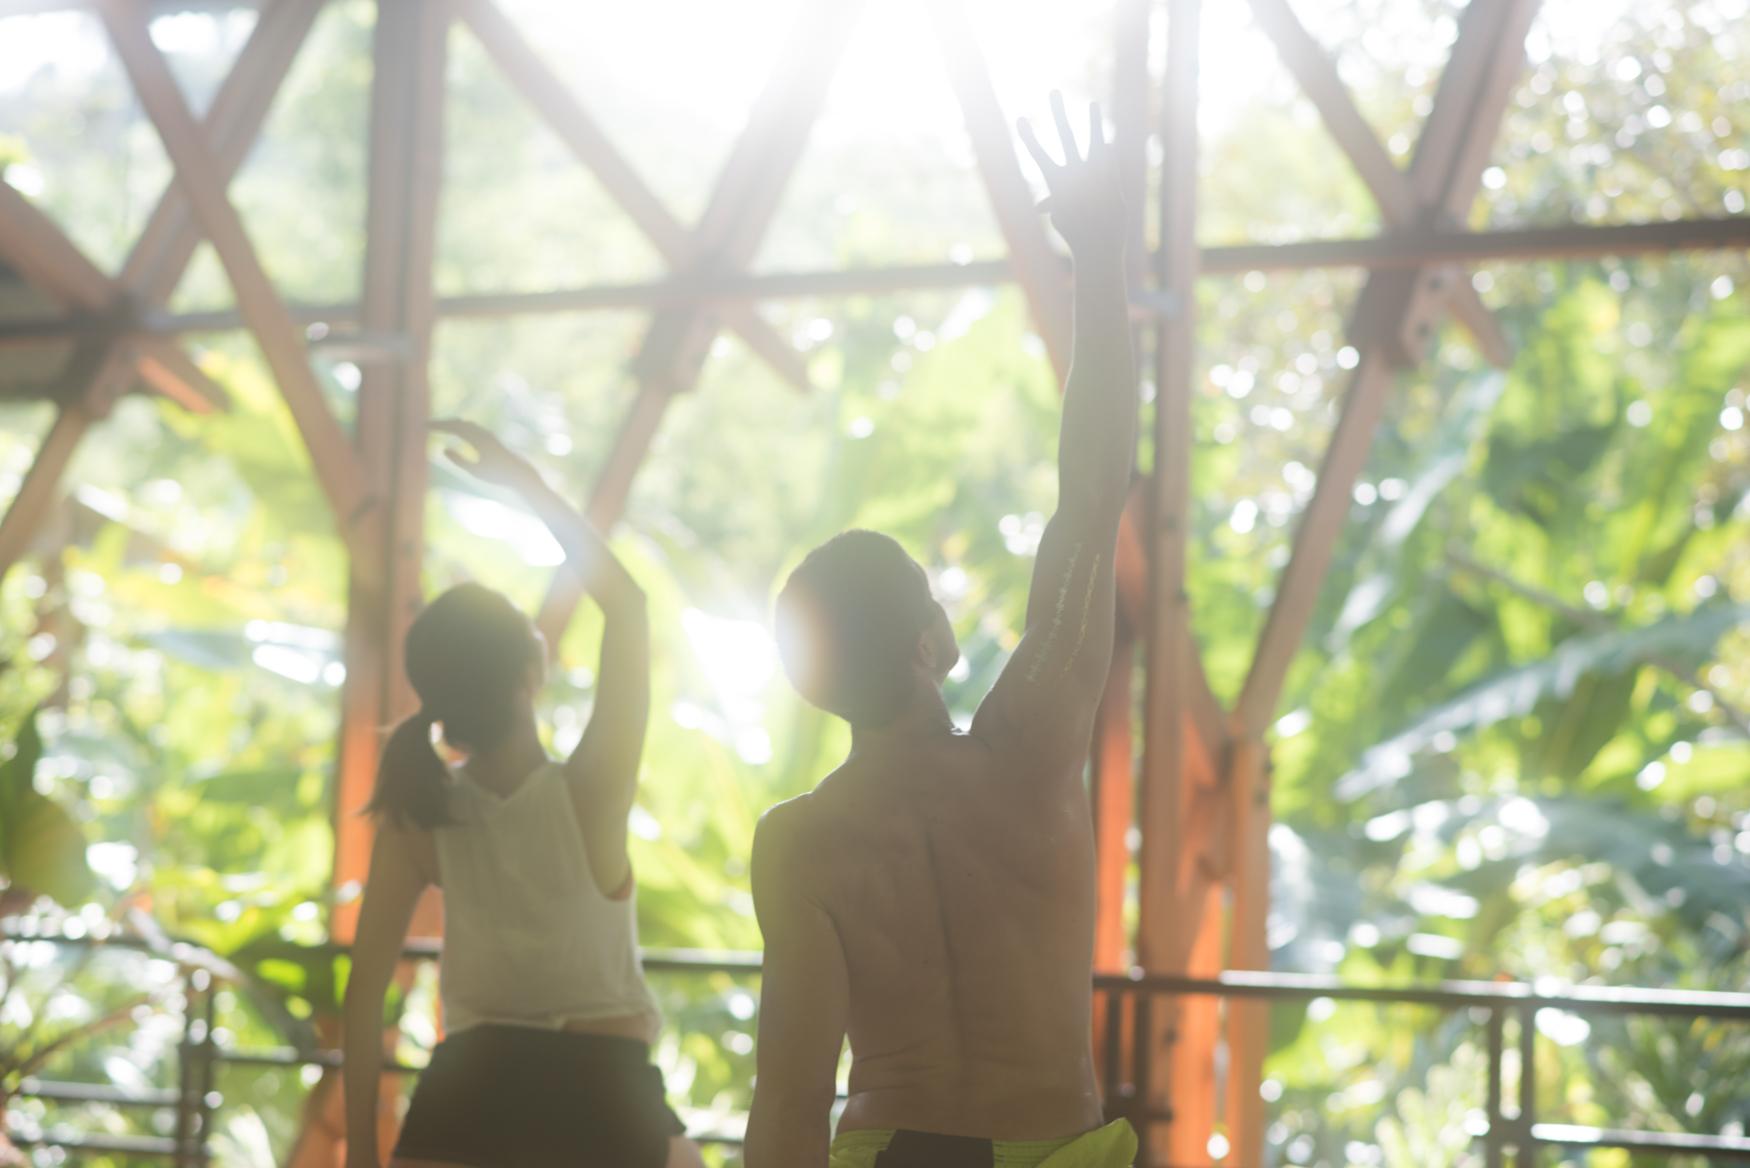 Yoga-Retreat-Photography-Costa-Rica-3.jpg